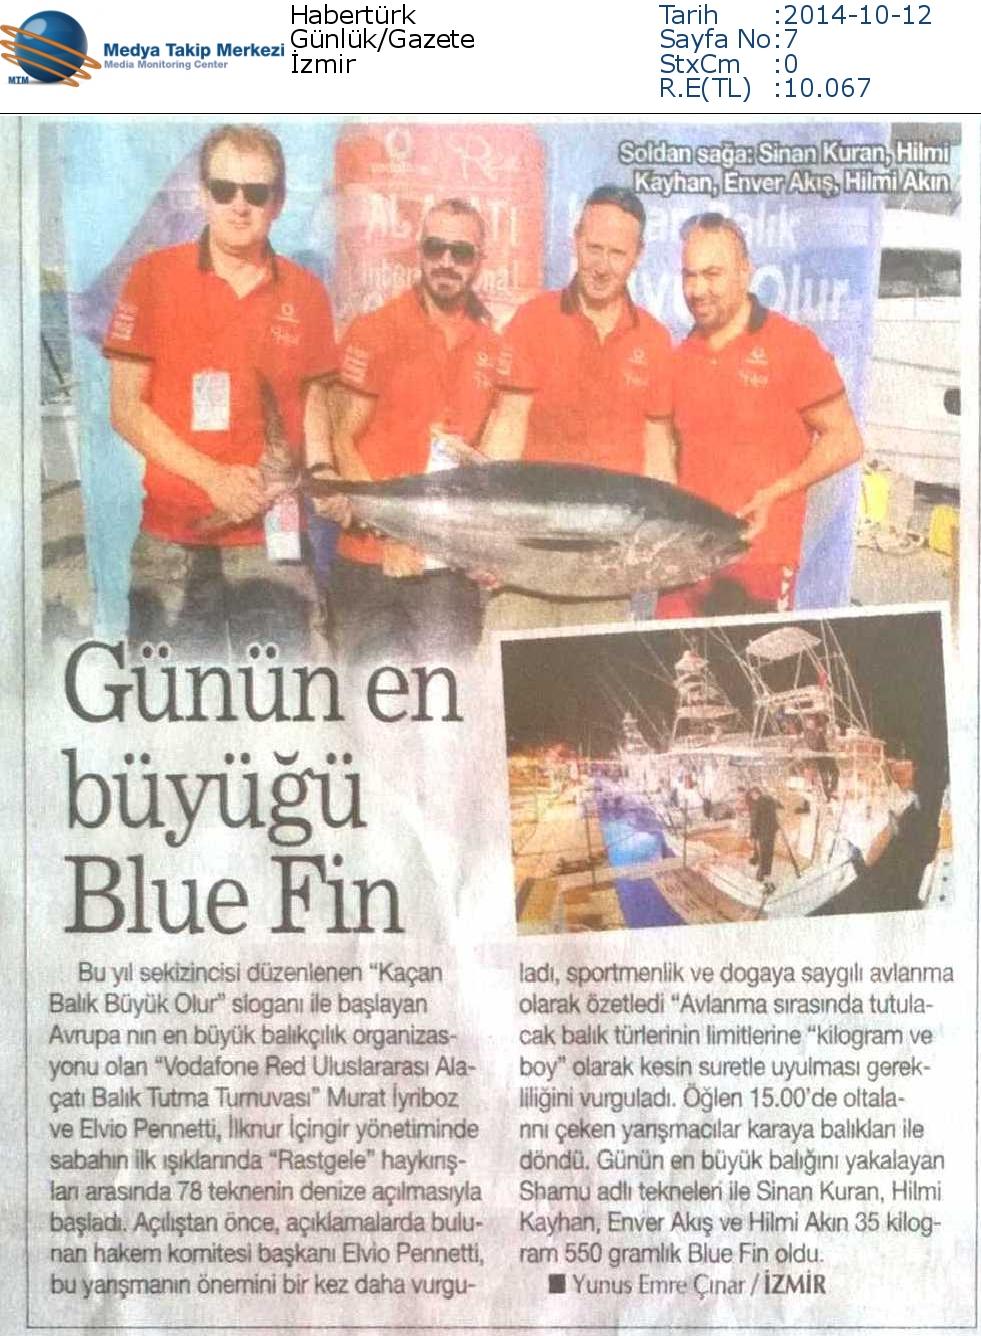 2514_6995_5355-Haberturk-GUNUN_EN_BUYUGU_BLUE_FIN-12.10.2014